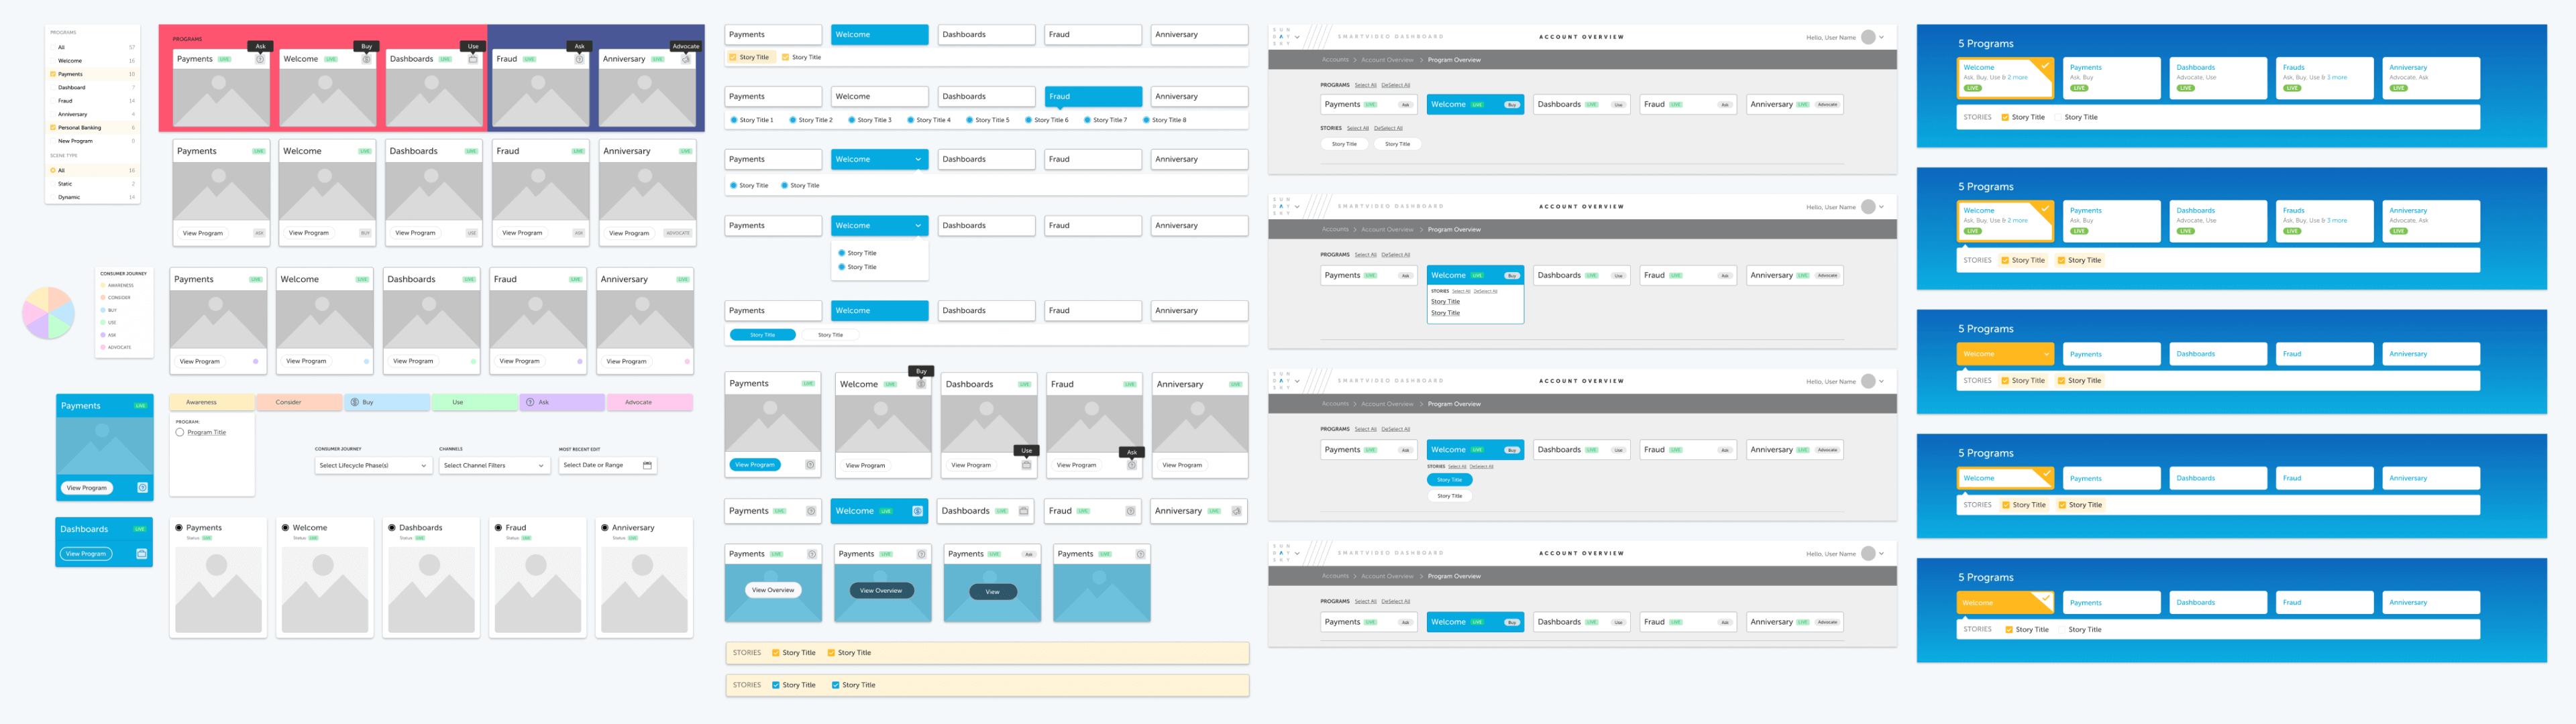 SSWeb-SundaySky-Navigation Tests